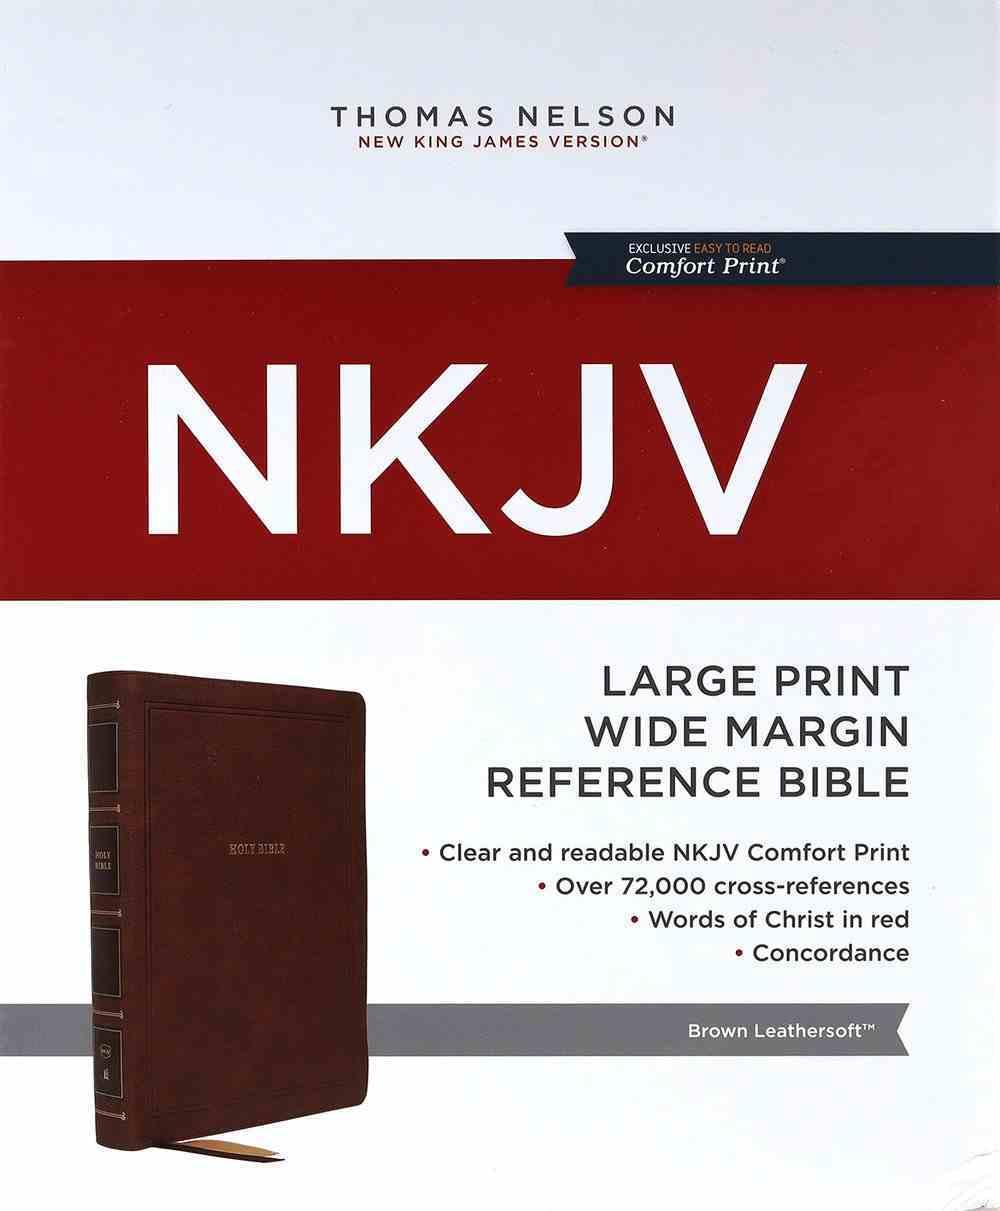 NKJV Reference Bible Wide Margin Large Print Brown (Red Letter Edition) Premium Imitation Leather